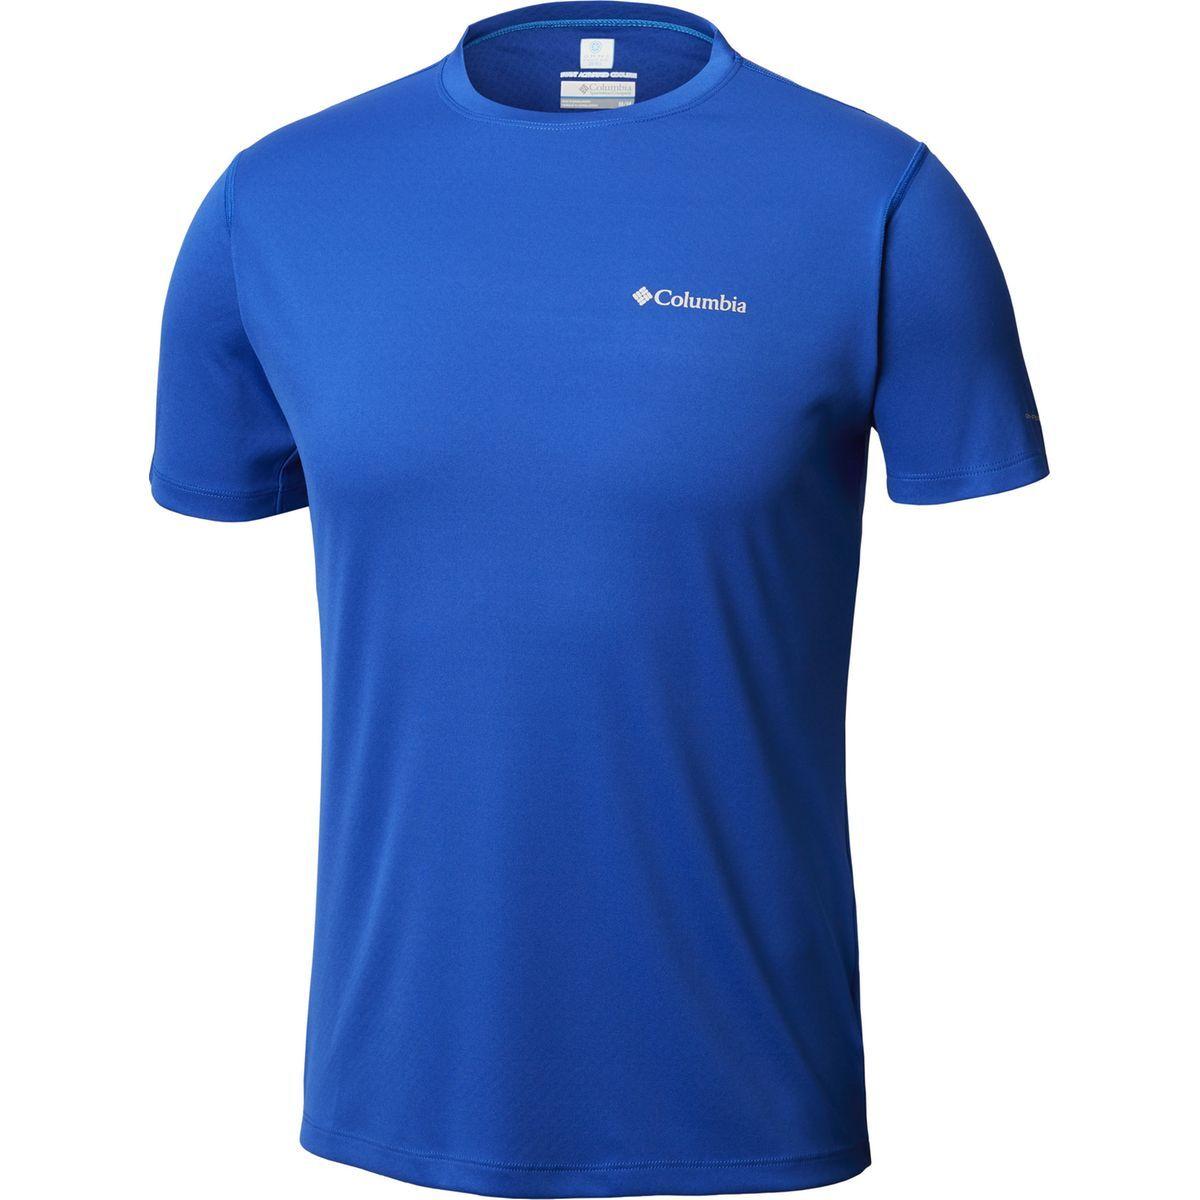 Zero Rules T shirt Manches Courtes Homme Bleu Taille